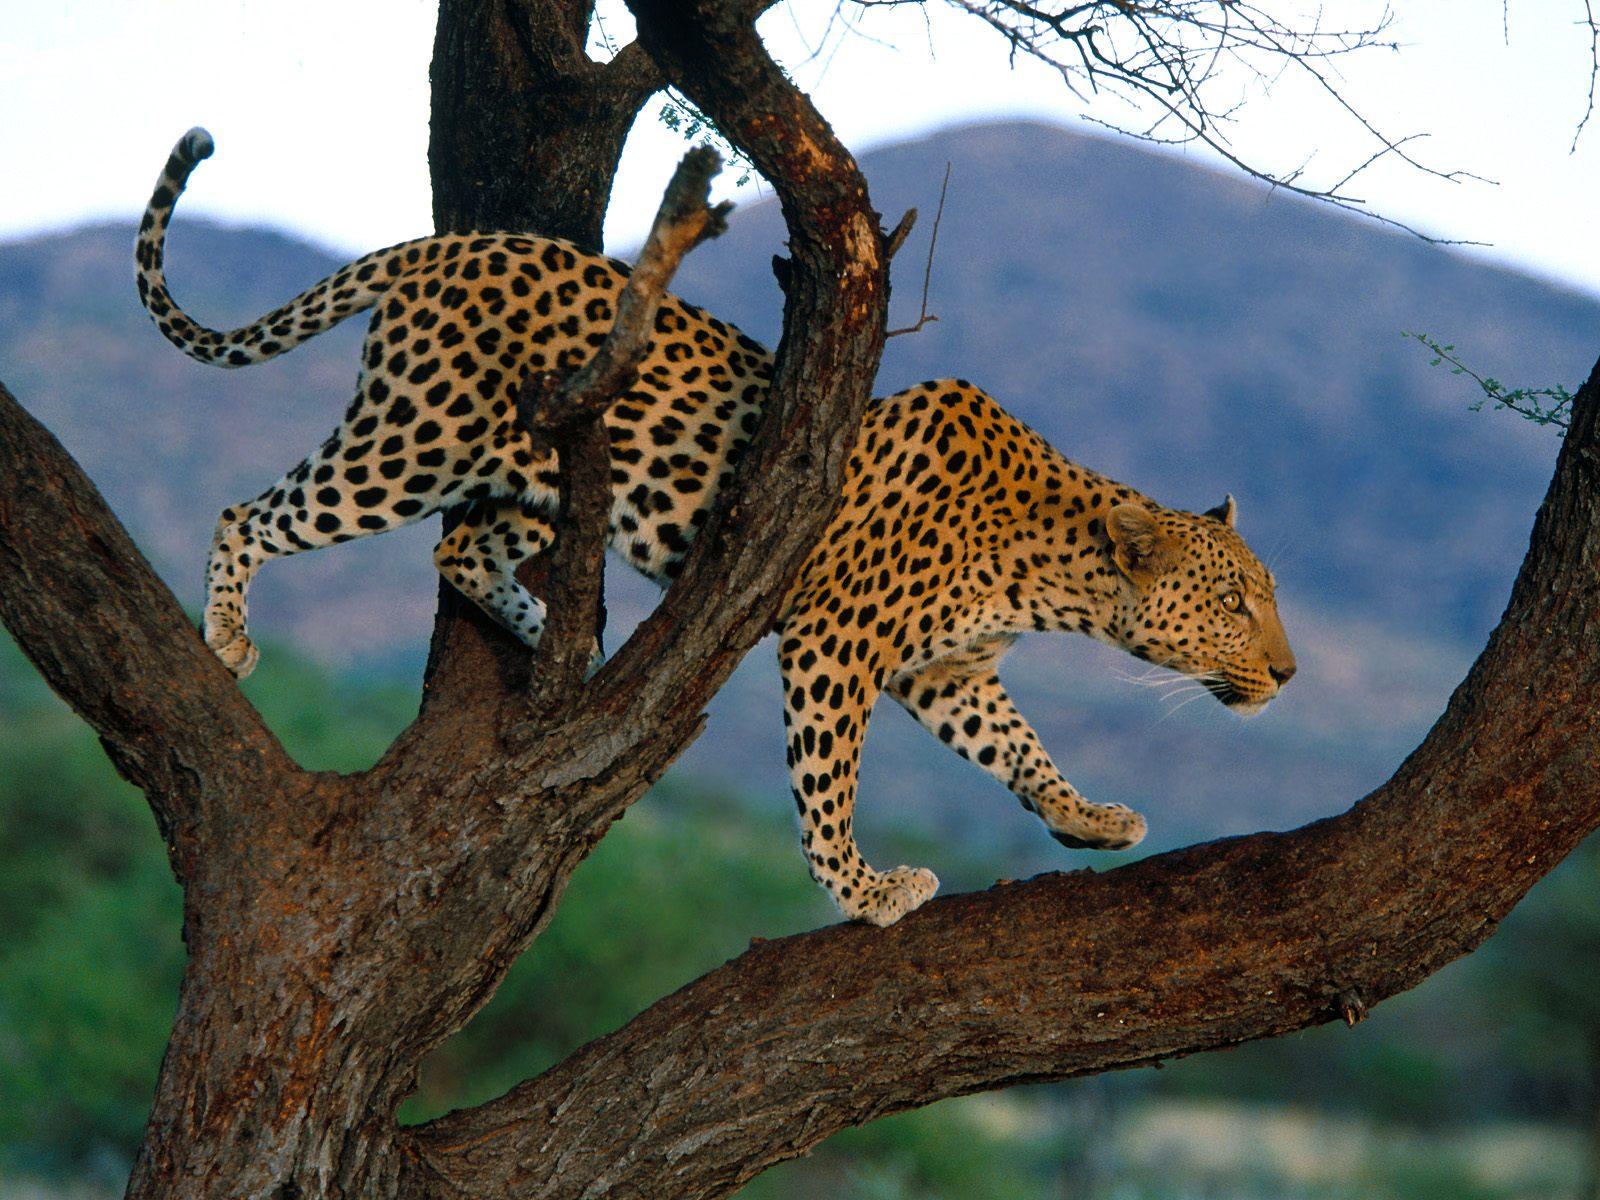 http://3.bp.blogspot.com/_BvTQDfwLKYY/TF58w-K_DnI/AAAAAAAABCY/j9MZCy3gIsg/s1600/Leopards.jpg